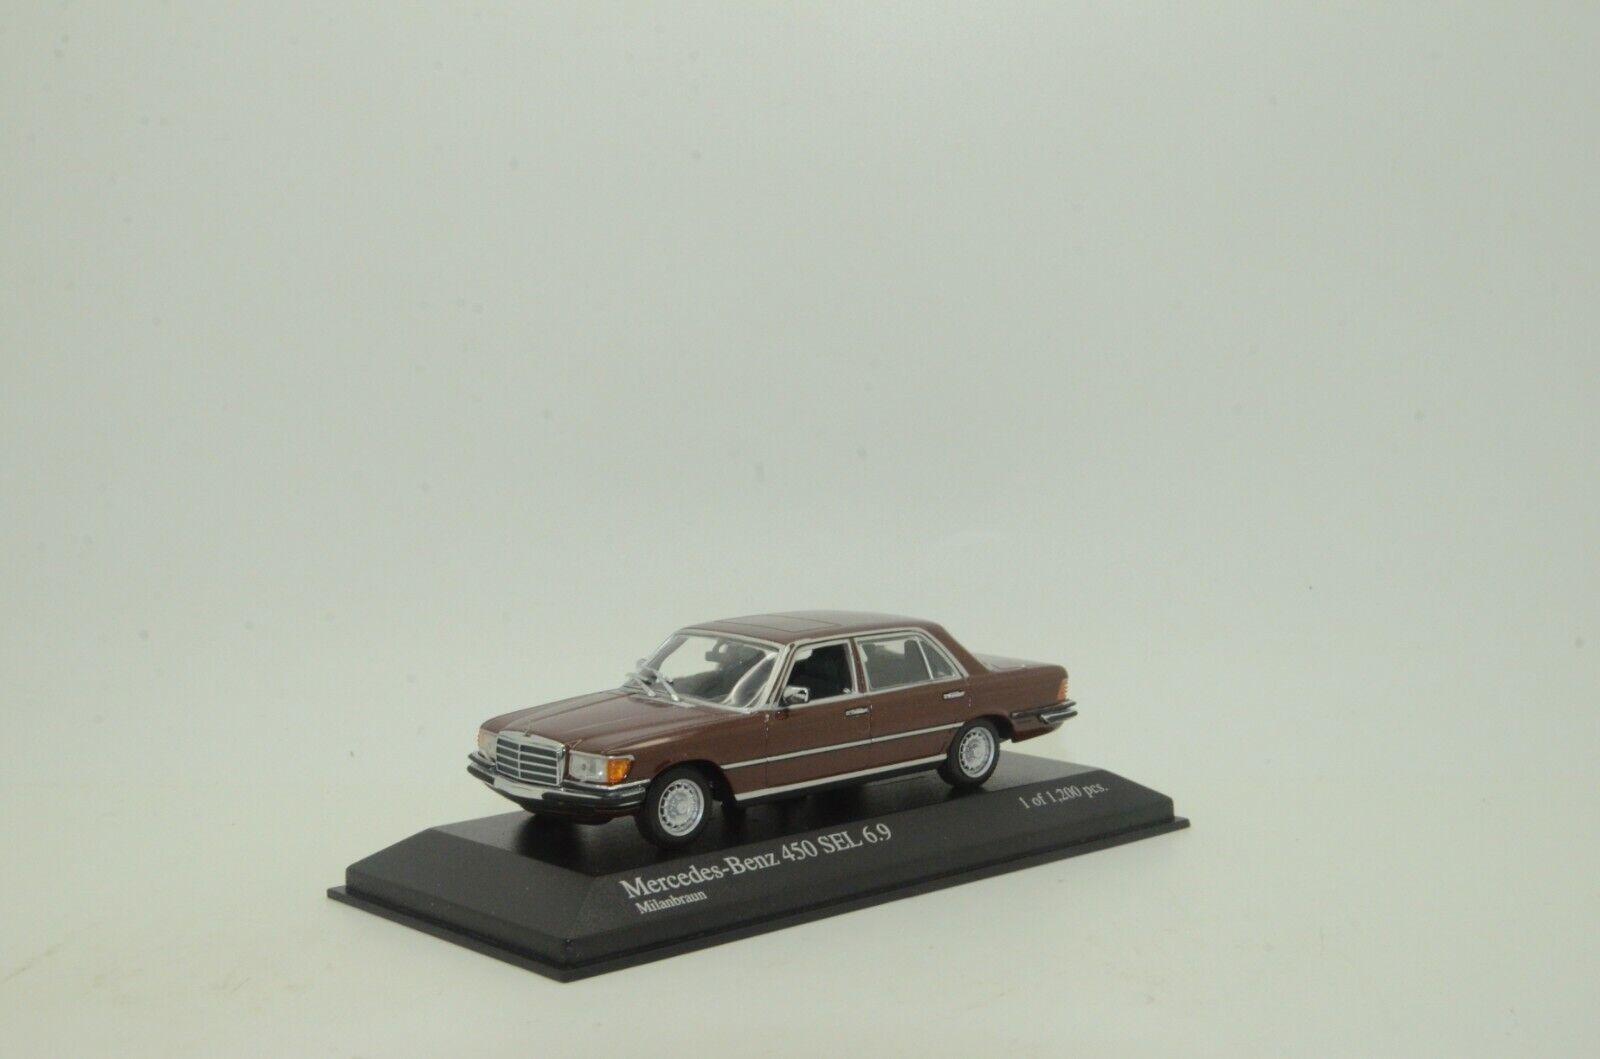 Mercedes 450 Sel 6.9 1974 Marrón Metálico Minichamps 39209 1 43